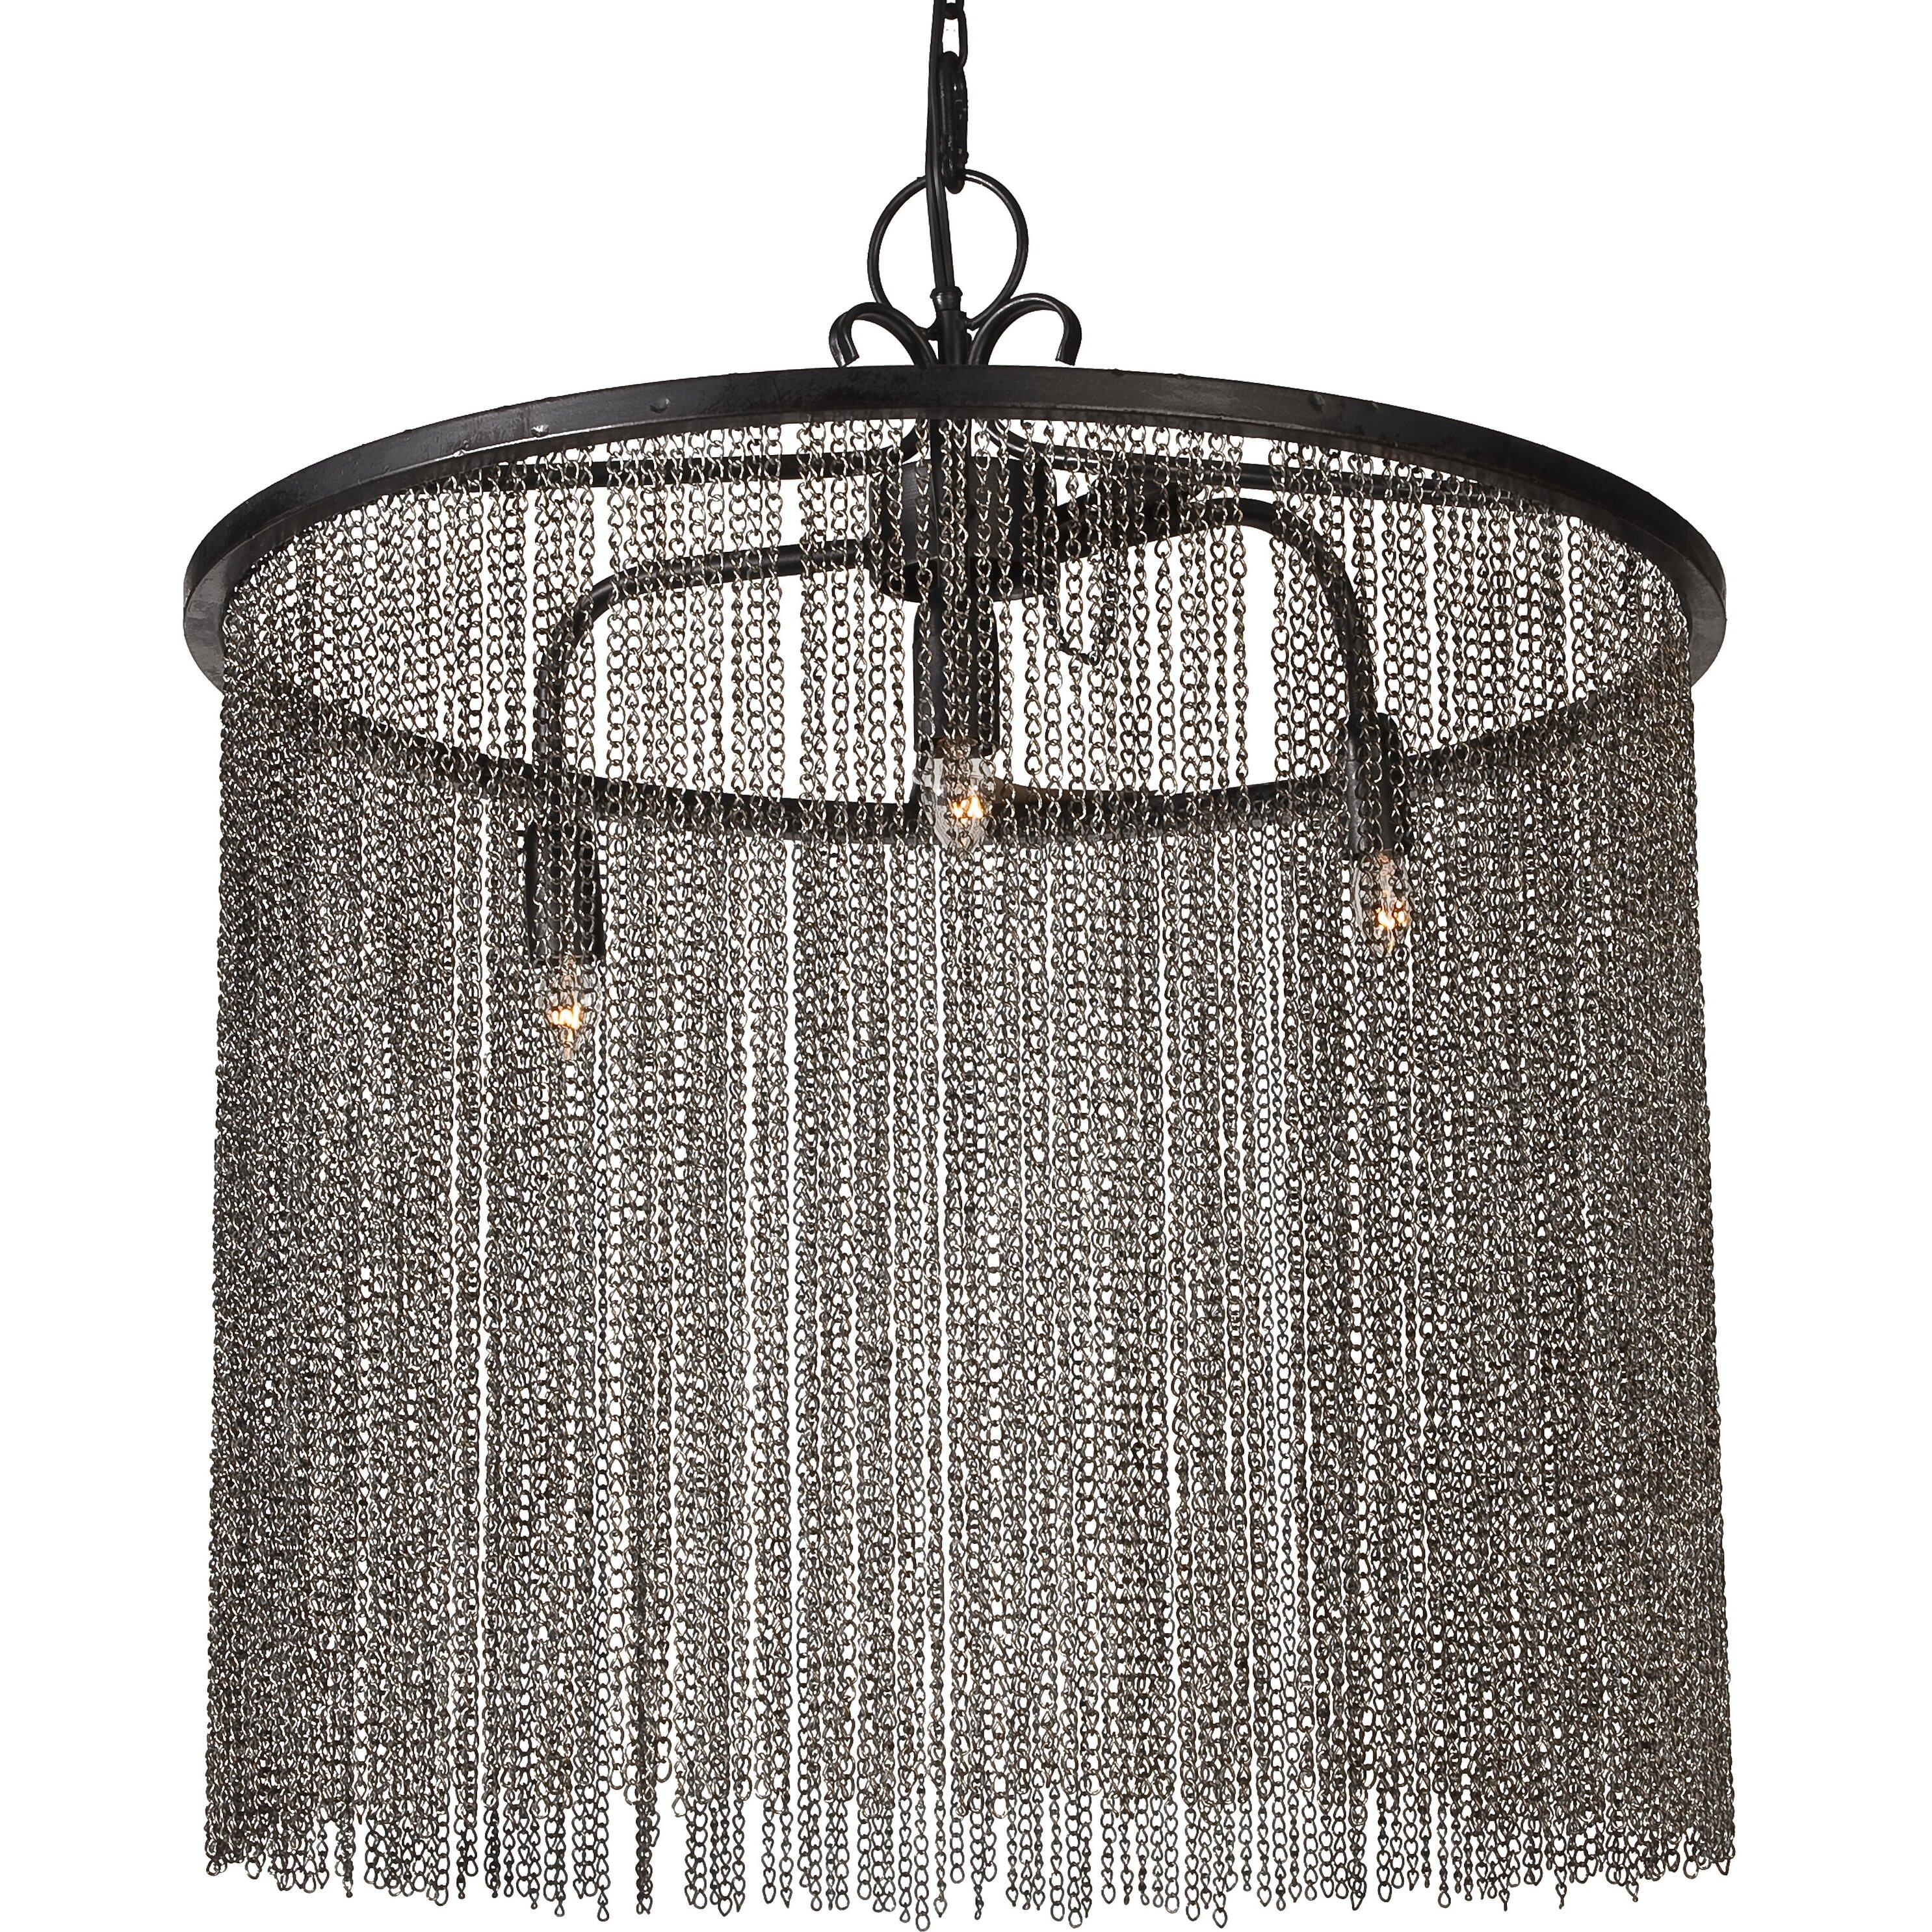 donny osmond 3 light drum chandelier reviews wayfair